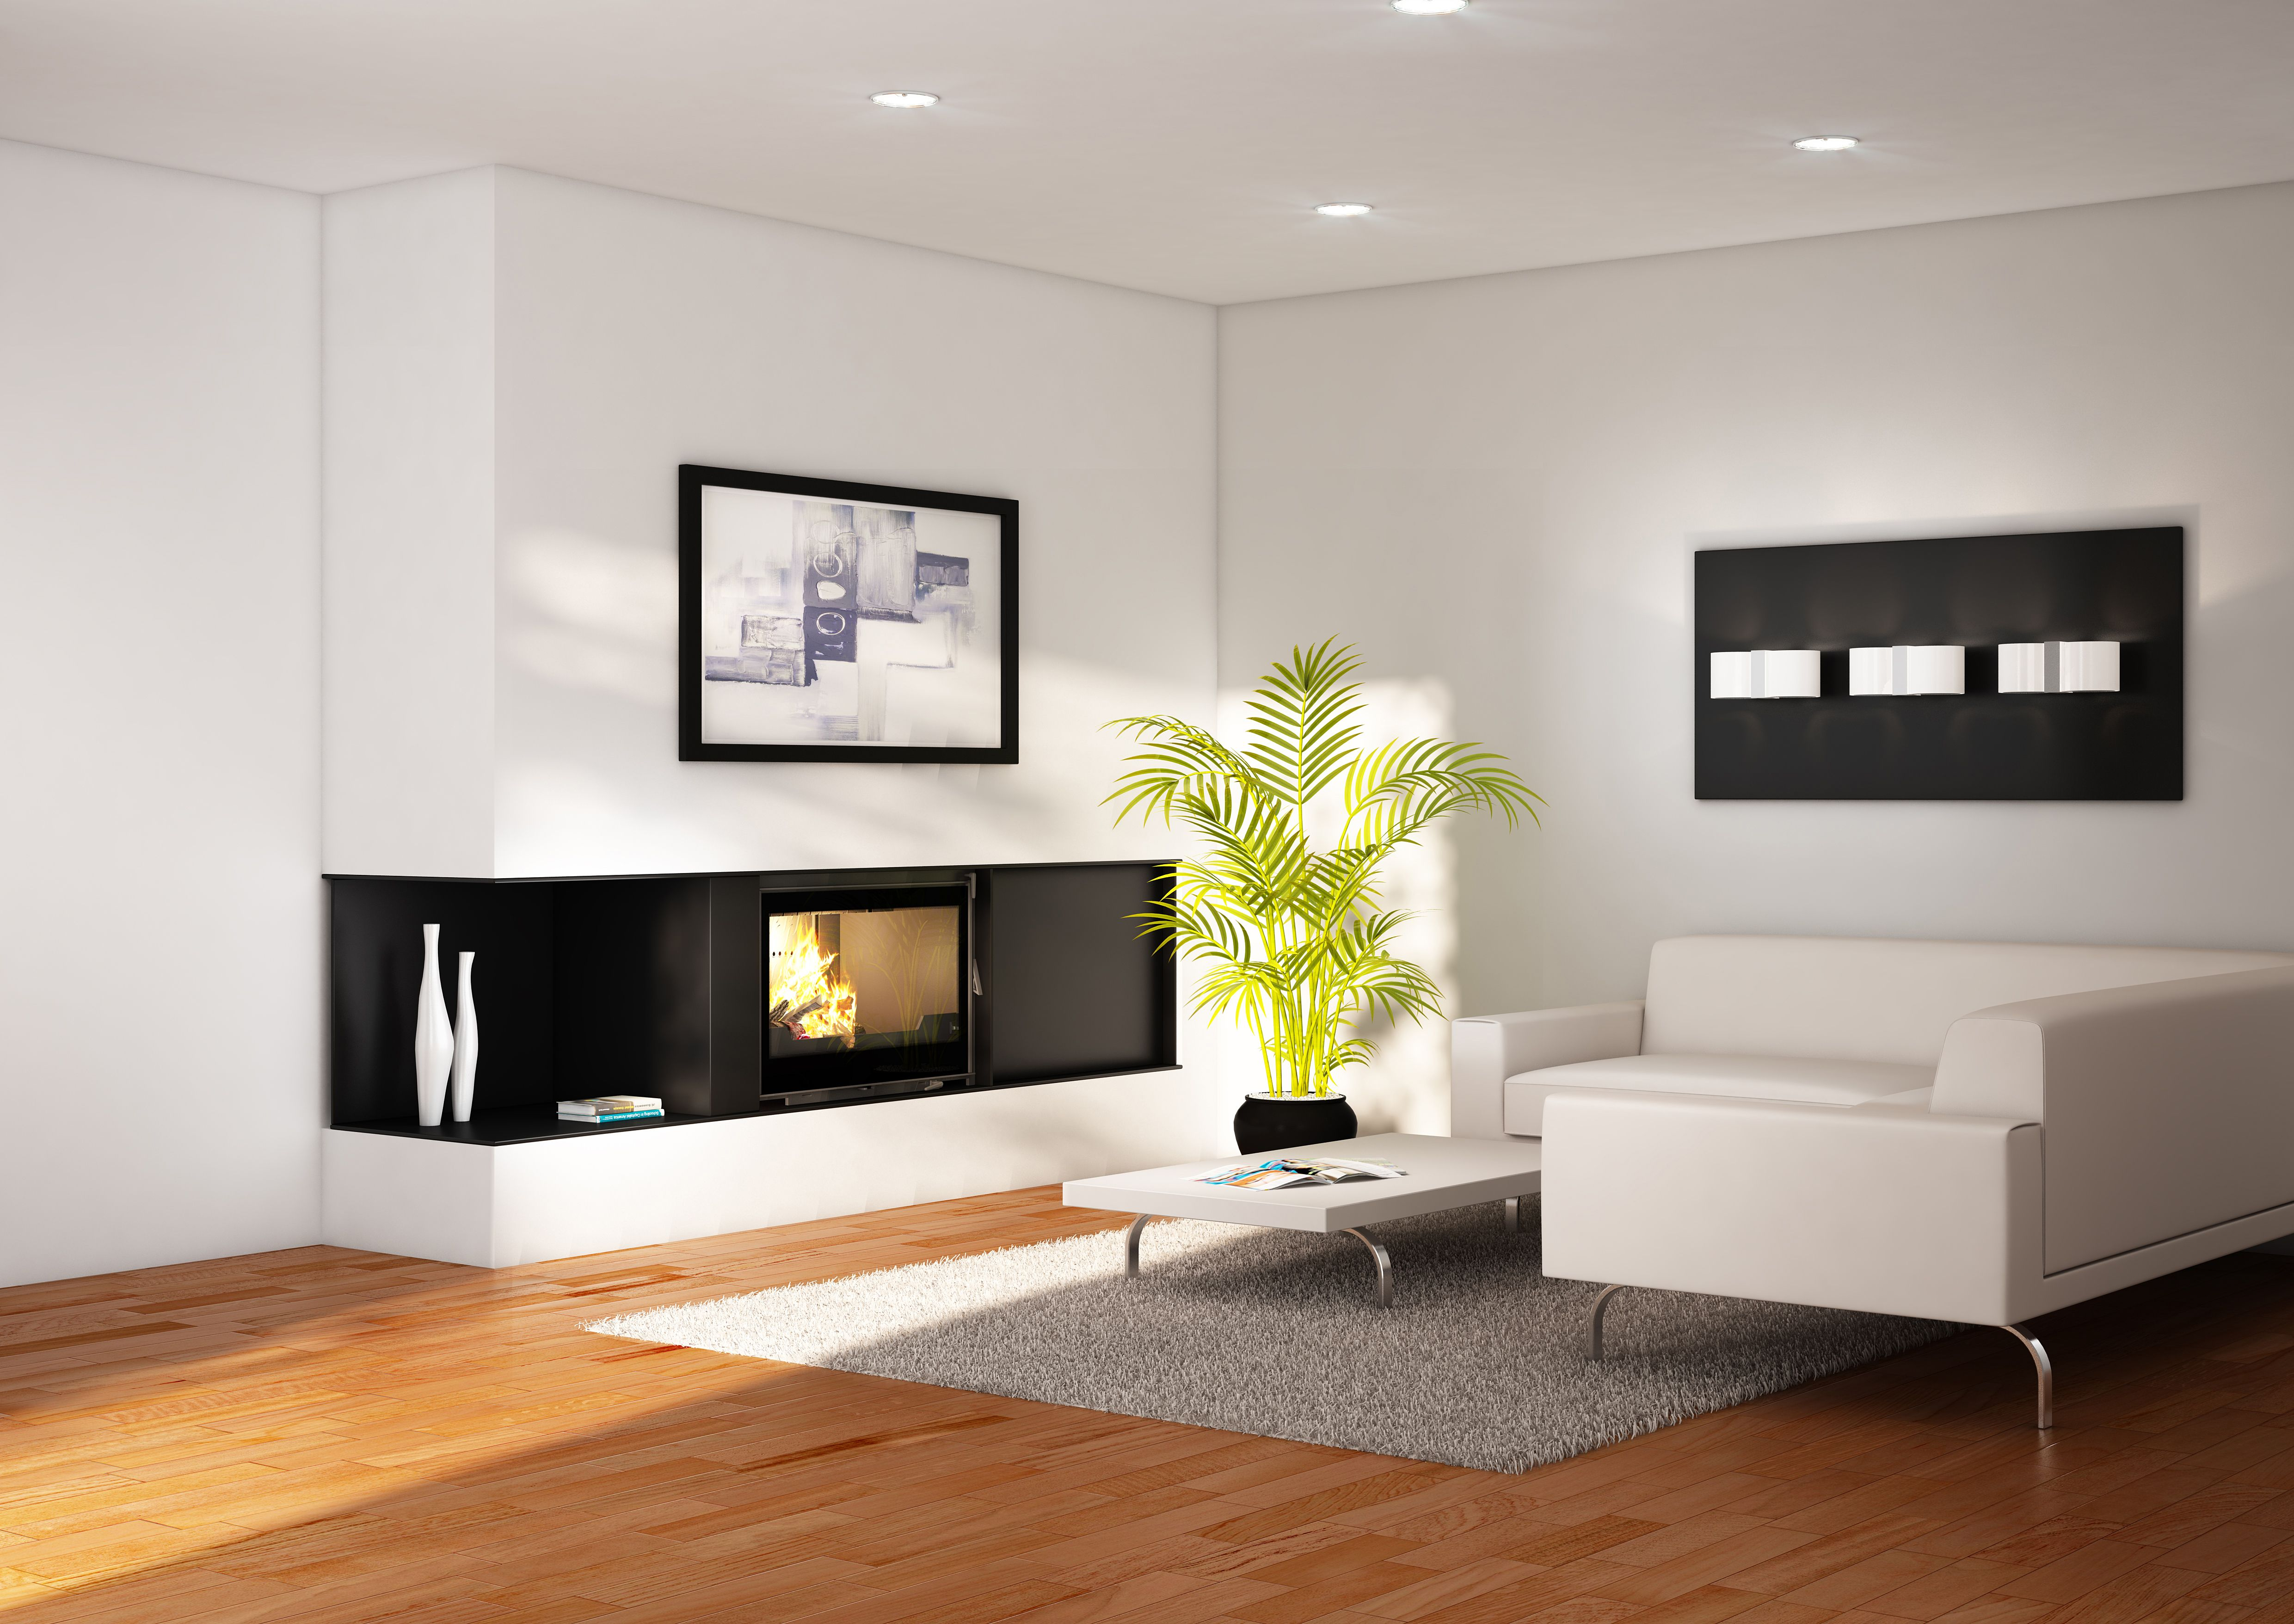 10 best seguin cast iron chimenee fireplace images on pinterest